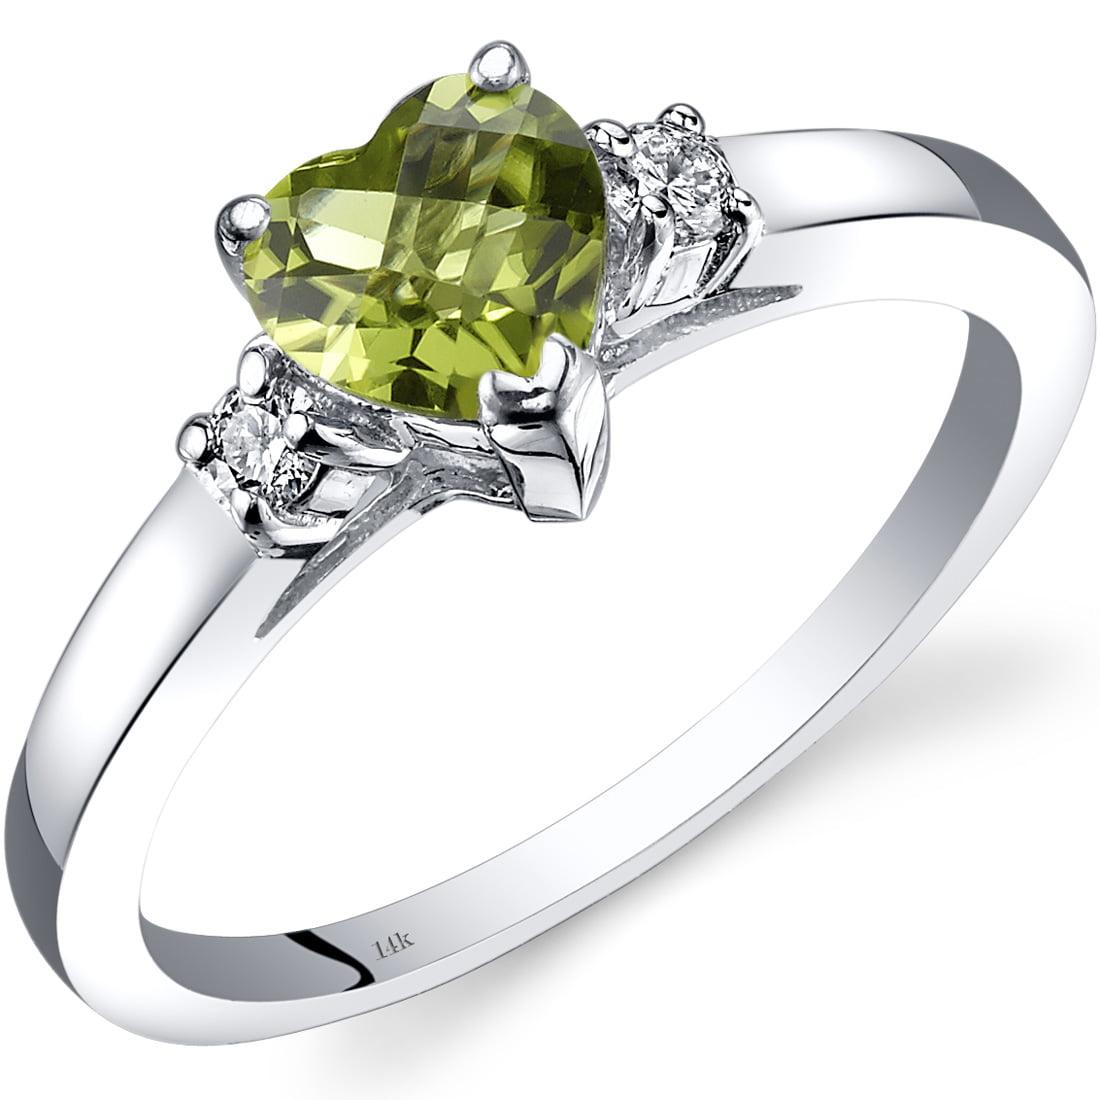 Peora 1 Carat T.G.W. Heart-Cut Peridot and Diamond Accent...